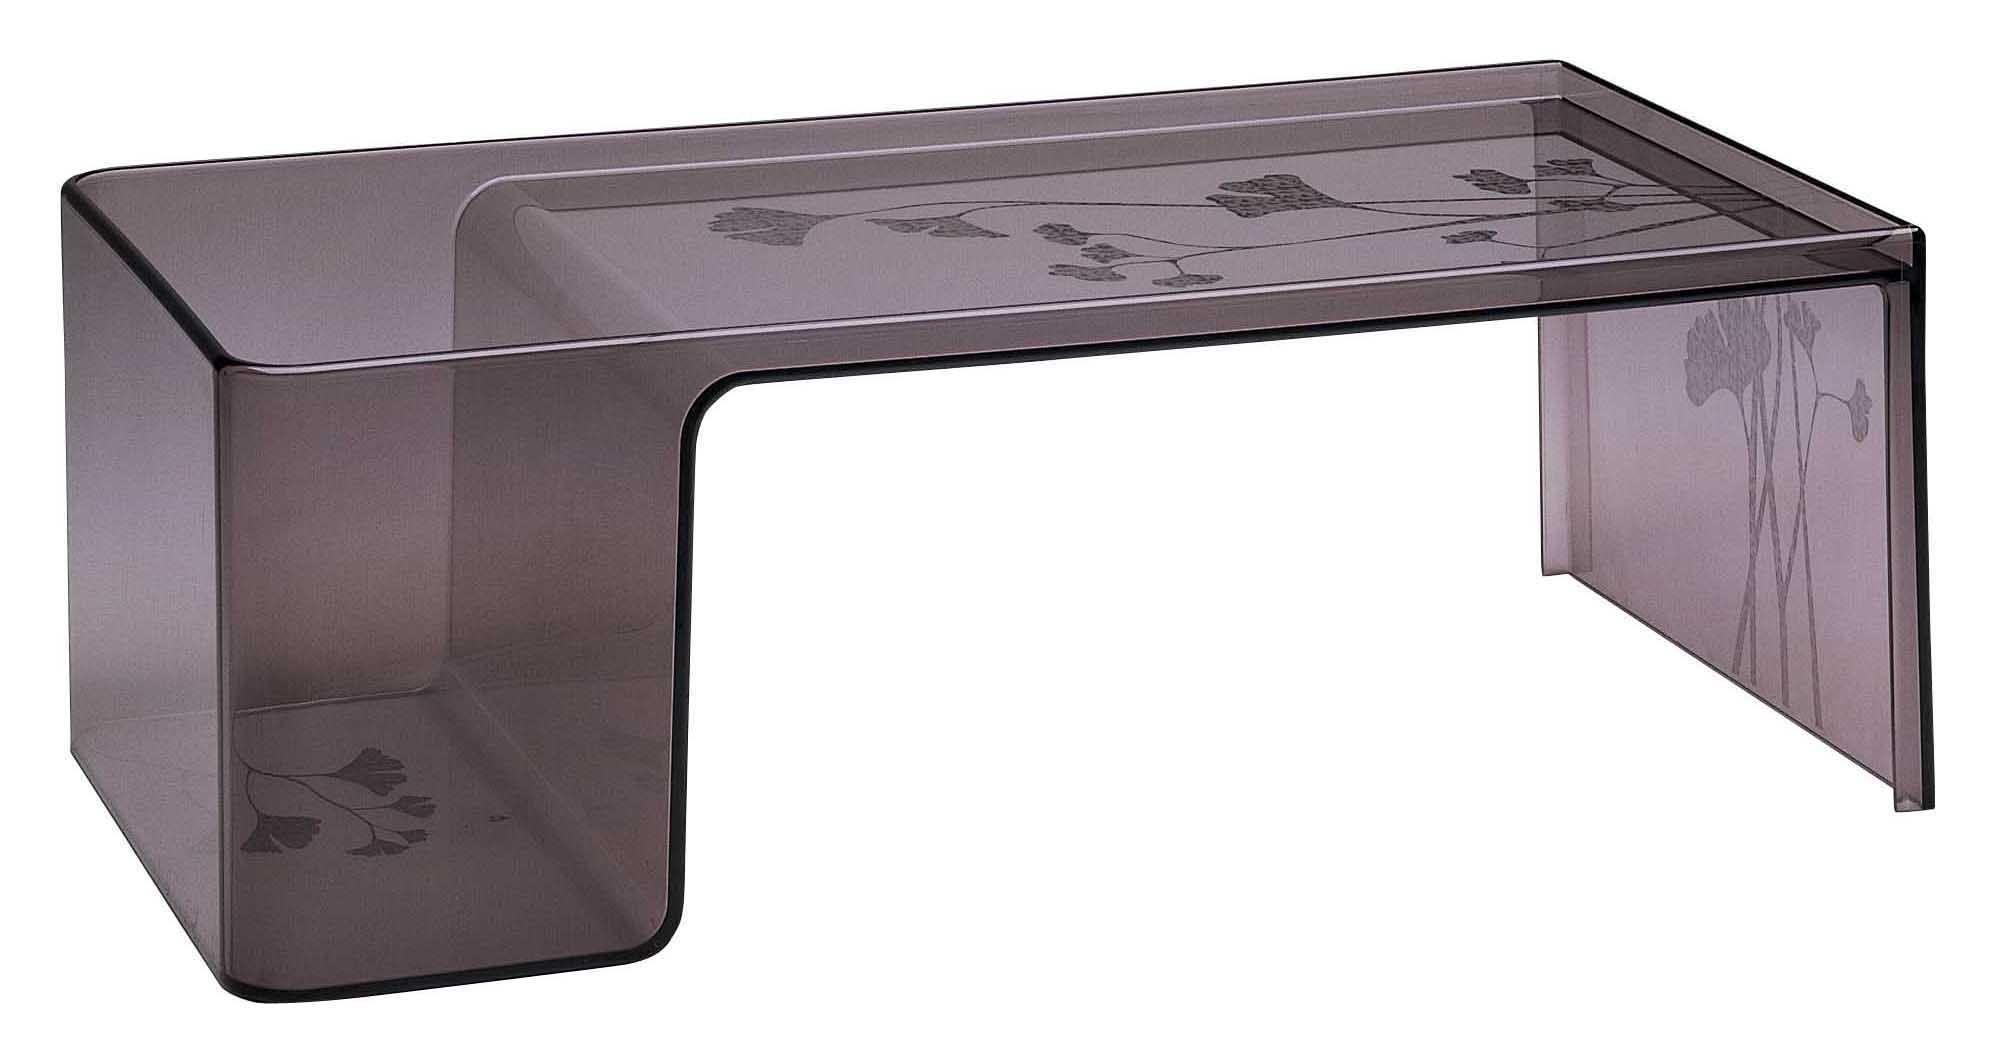 Usame Coffee Table Black Smoke By Kartell